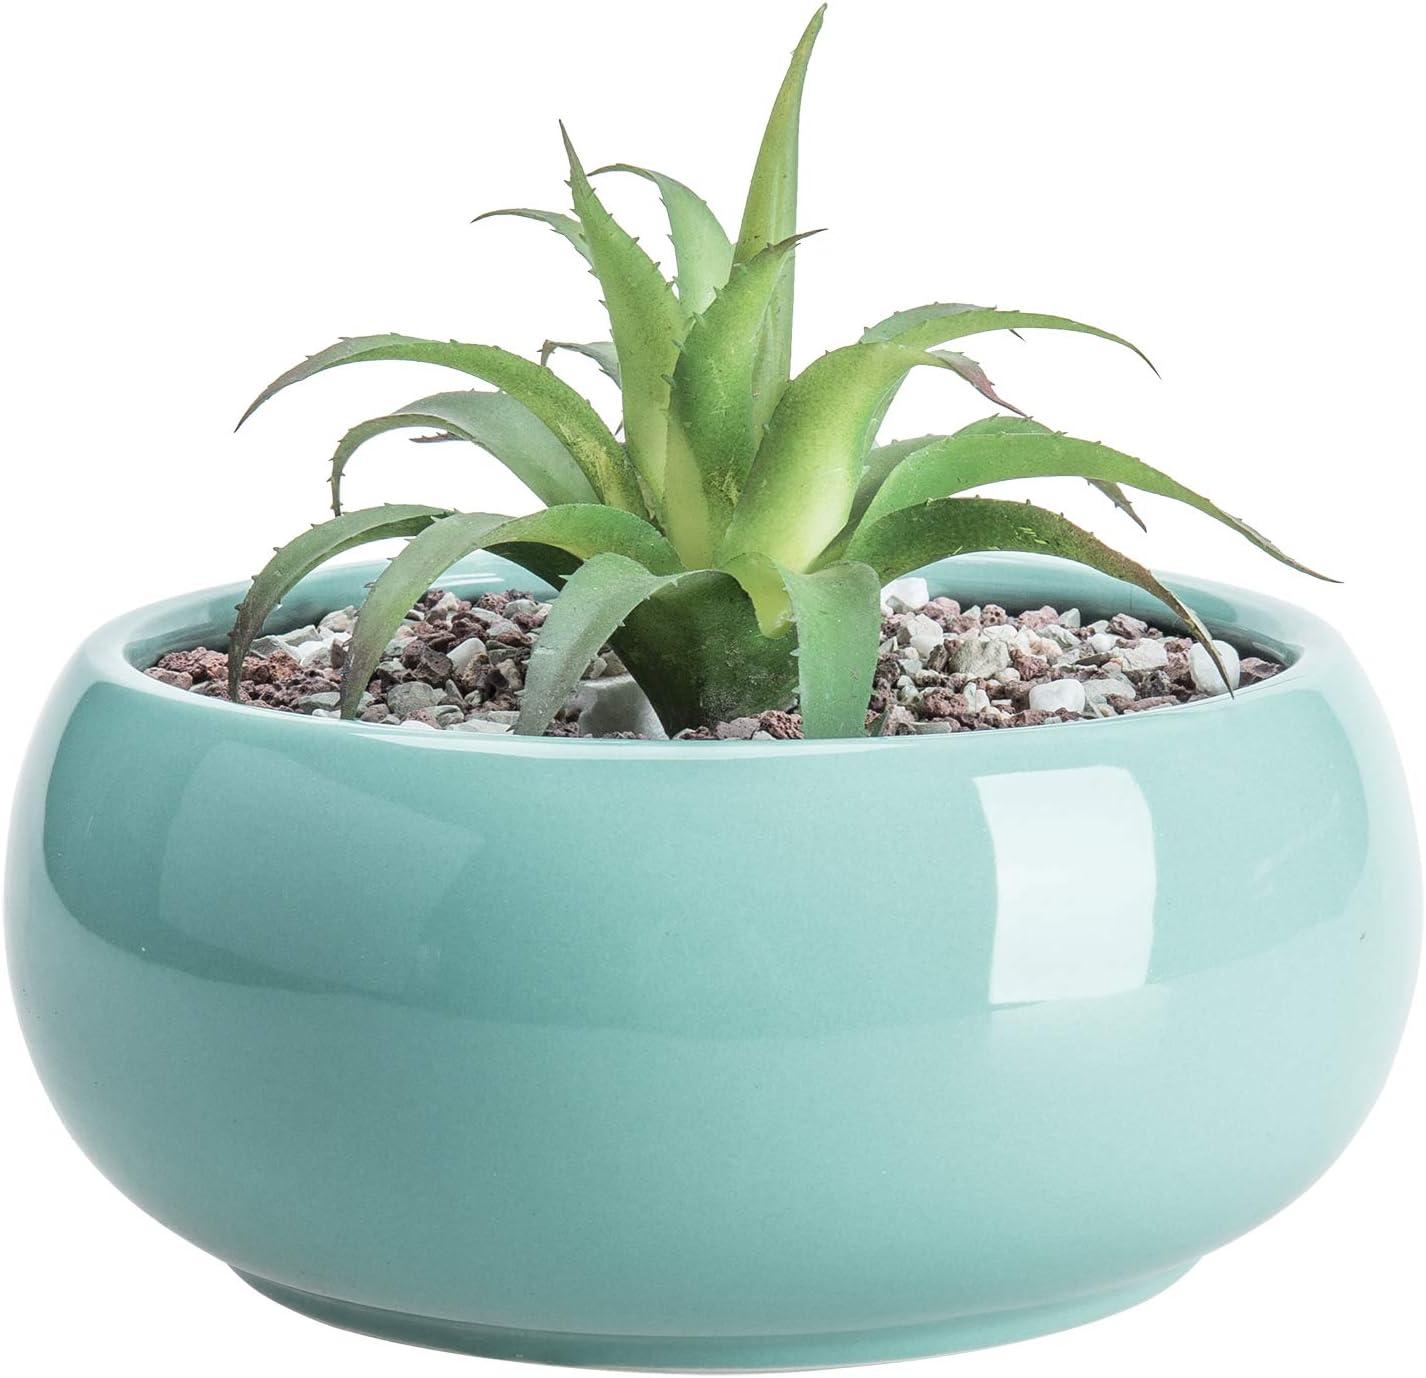 MyGift 7.5 Inch Round Aqua Blue Glazed Ceramic Succulent Planter Pot